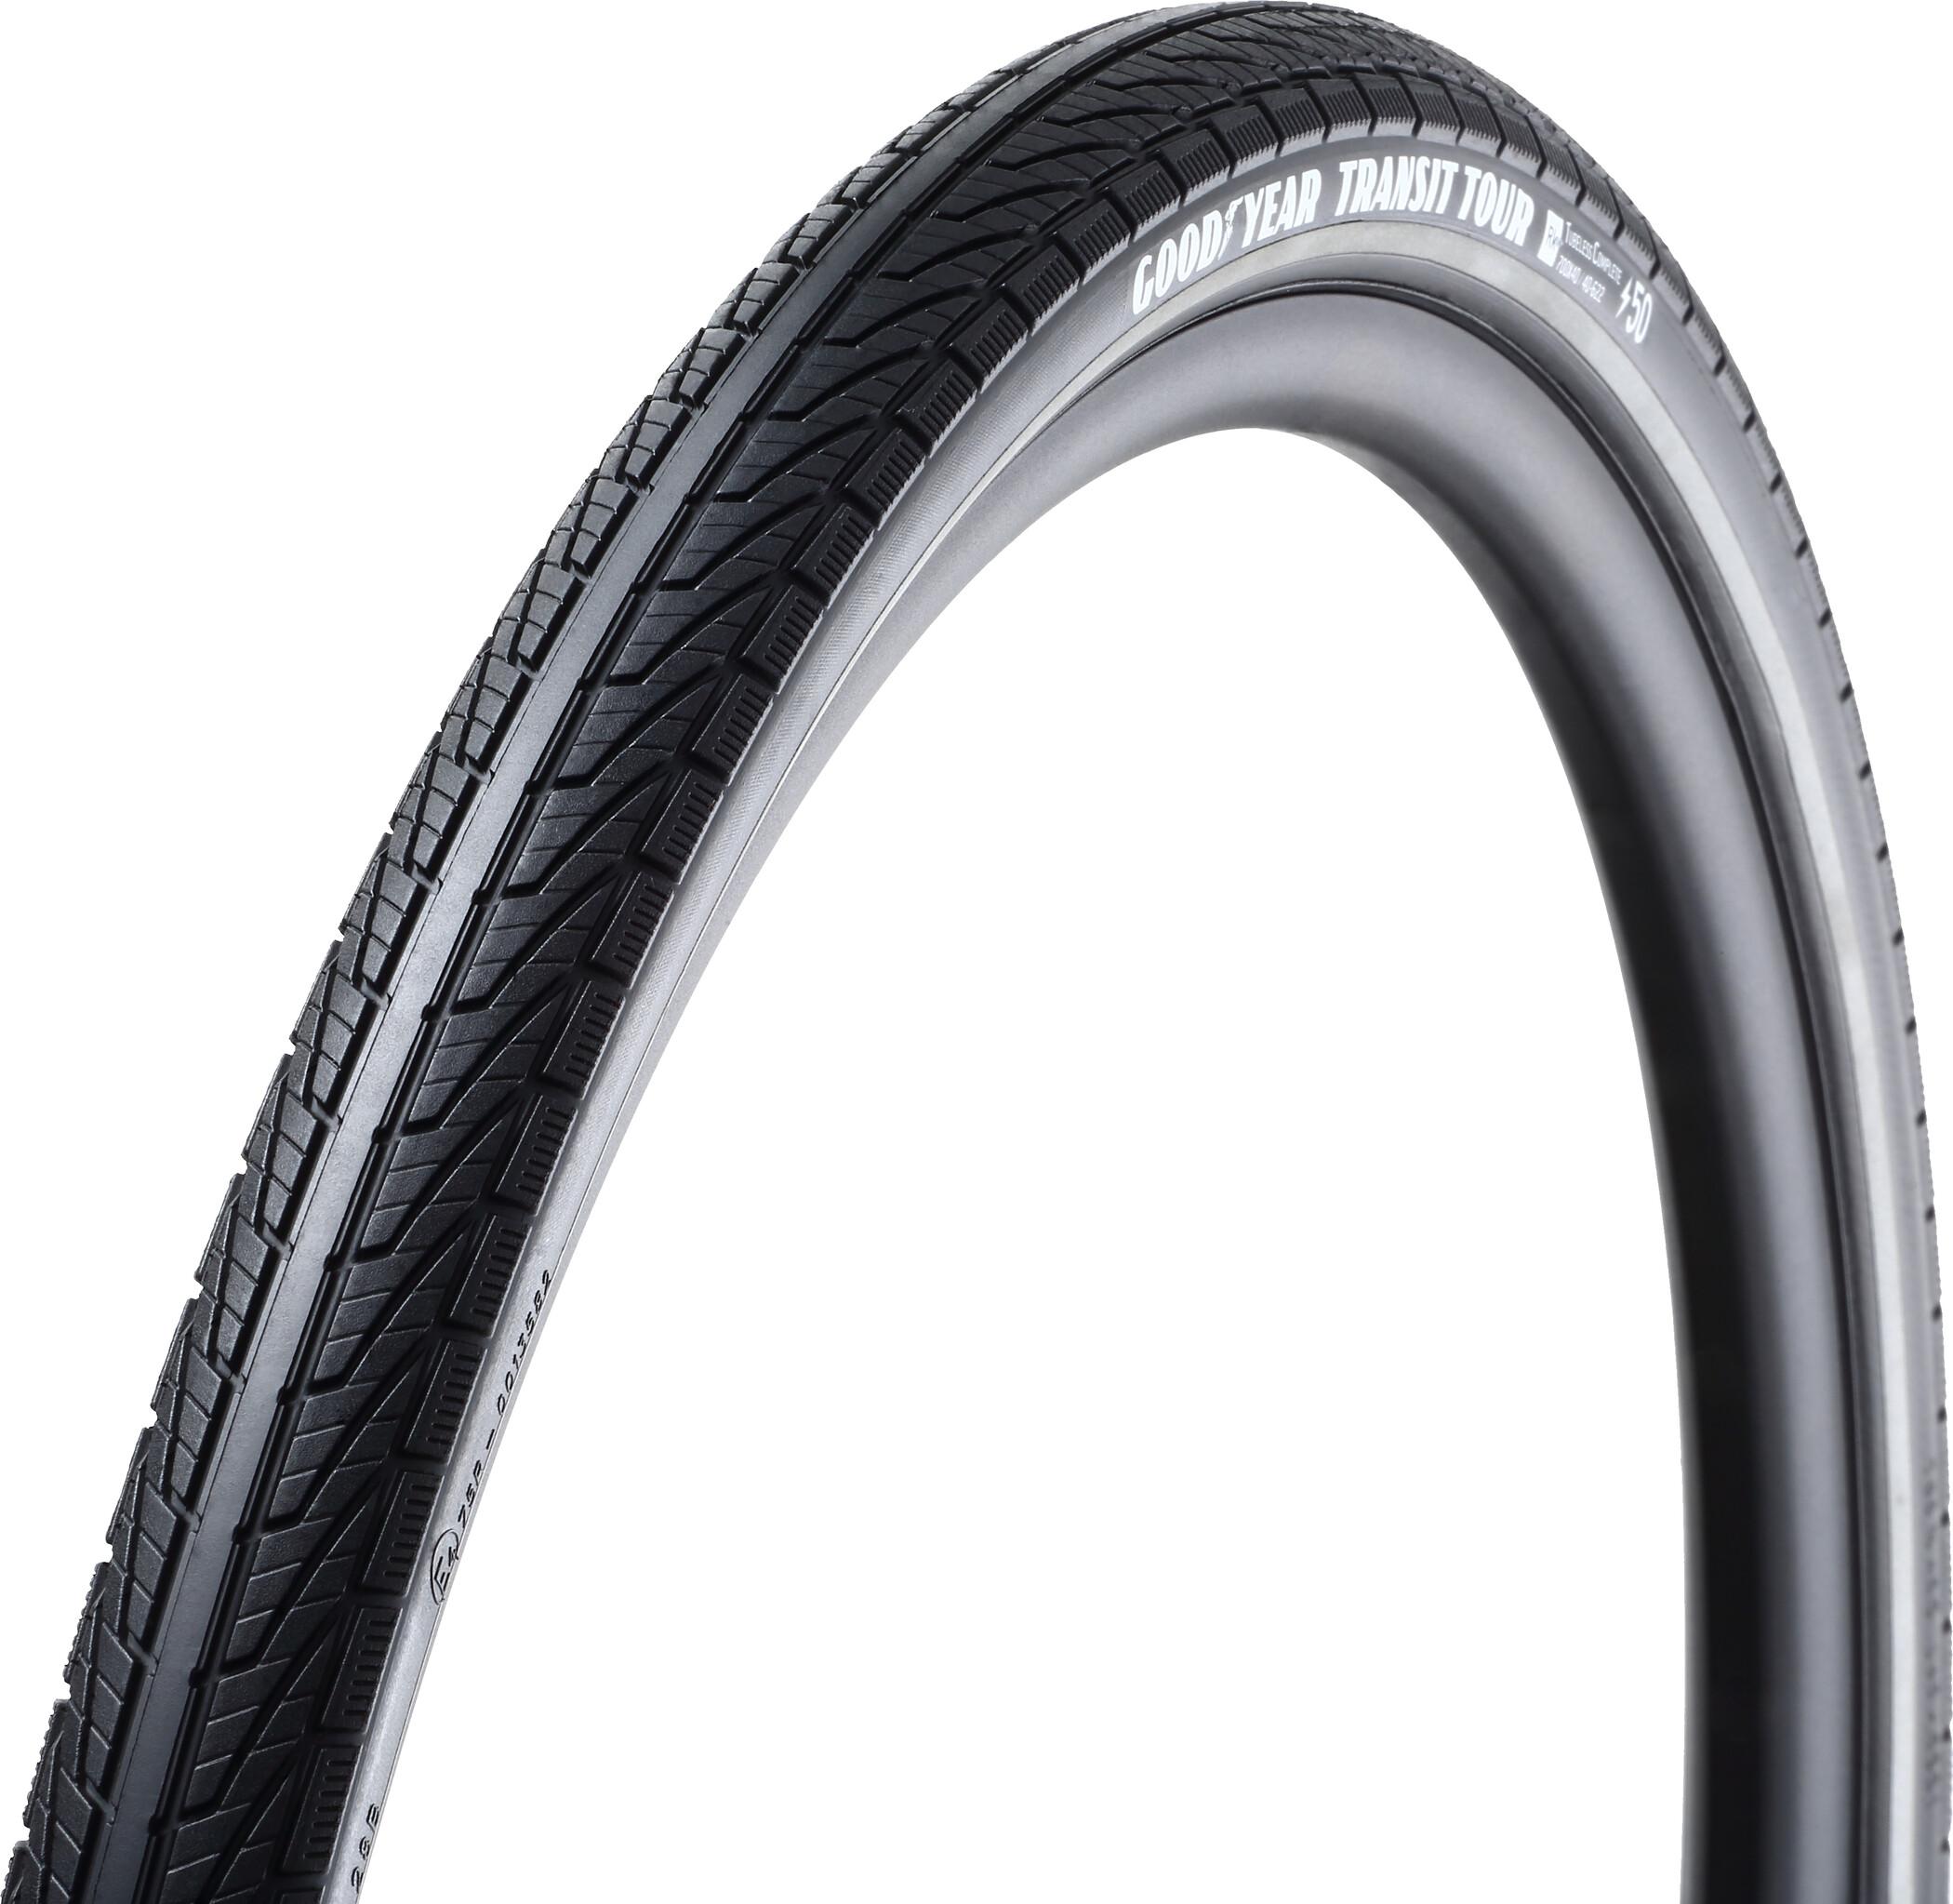 Goodyear Transit Tour Dæk 35-622 Secure e50, black reflected (2019)   Tyres